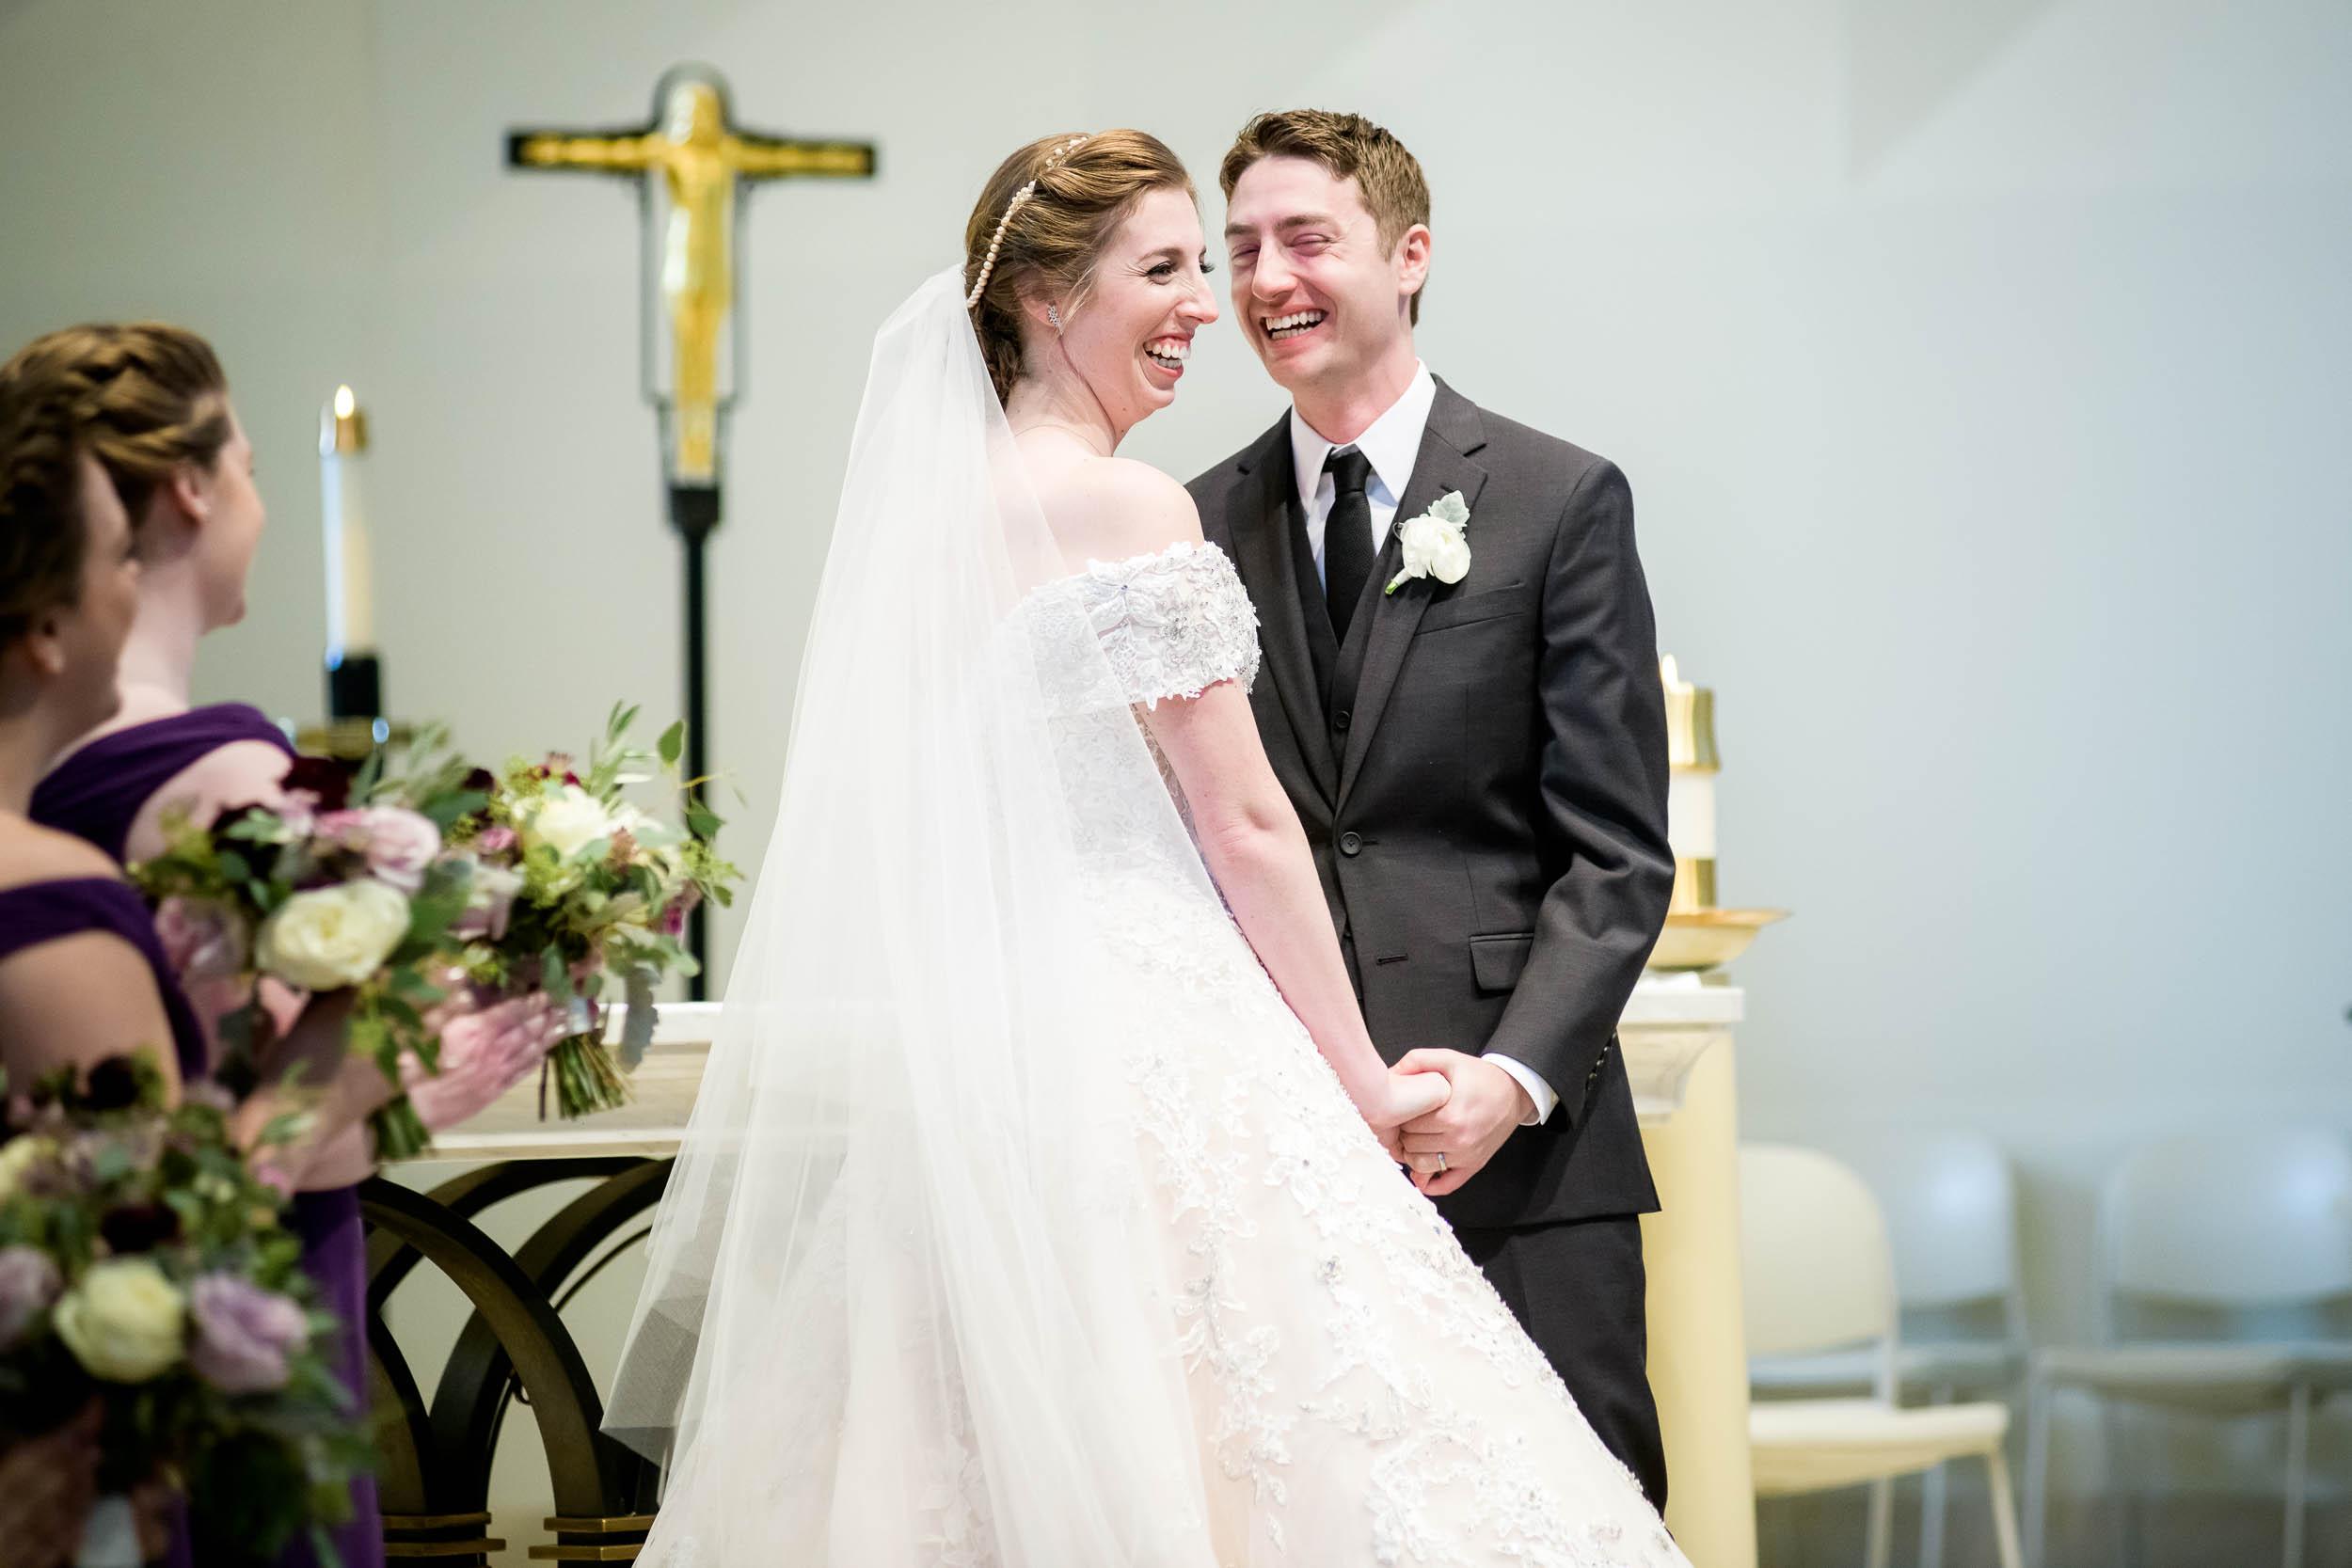 Bride and groom share a laugh during a wedding ceremony at Madonna Della Strada.